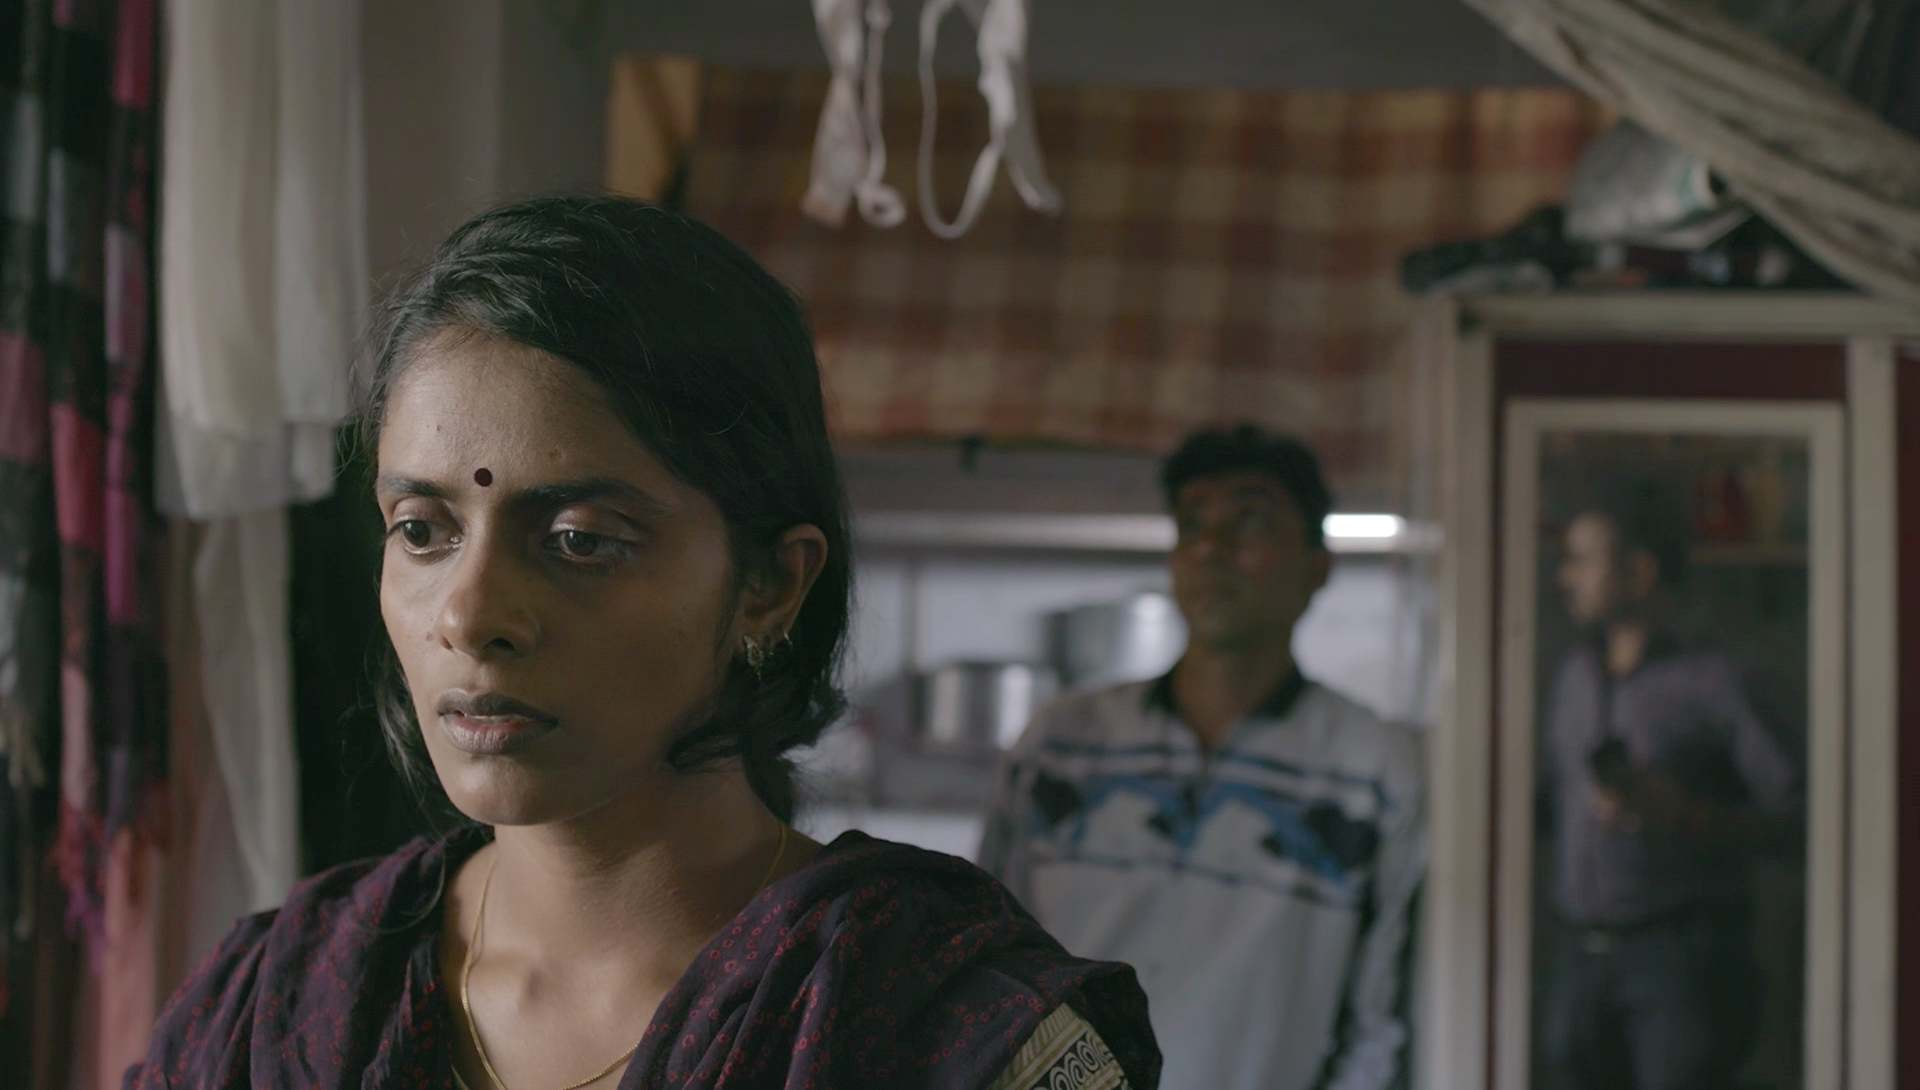 Still from Counterfeit Kunkoo, directed by Reema Sengupta